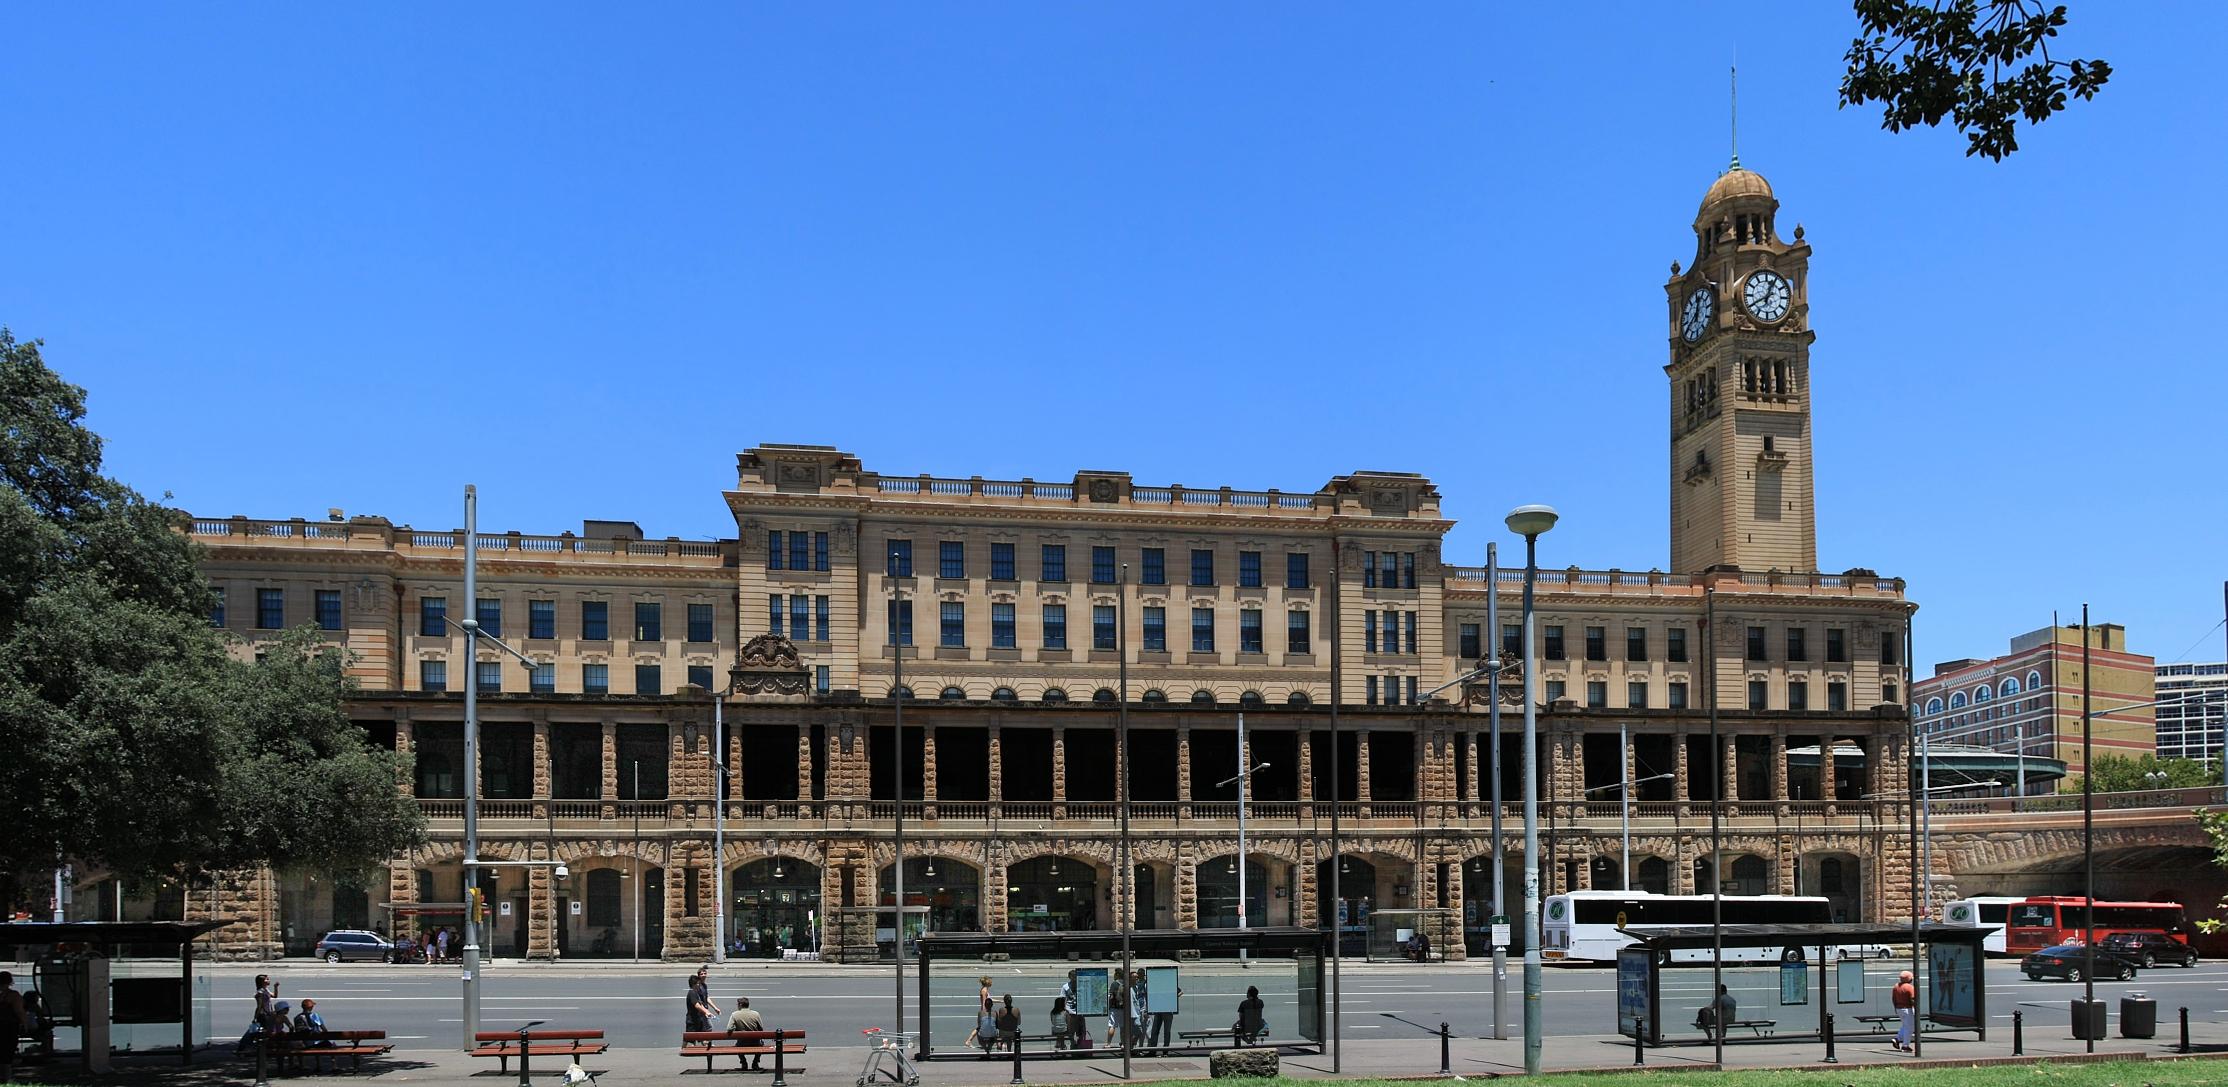 Central_station_Sydney_NSW1.jpg